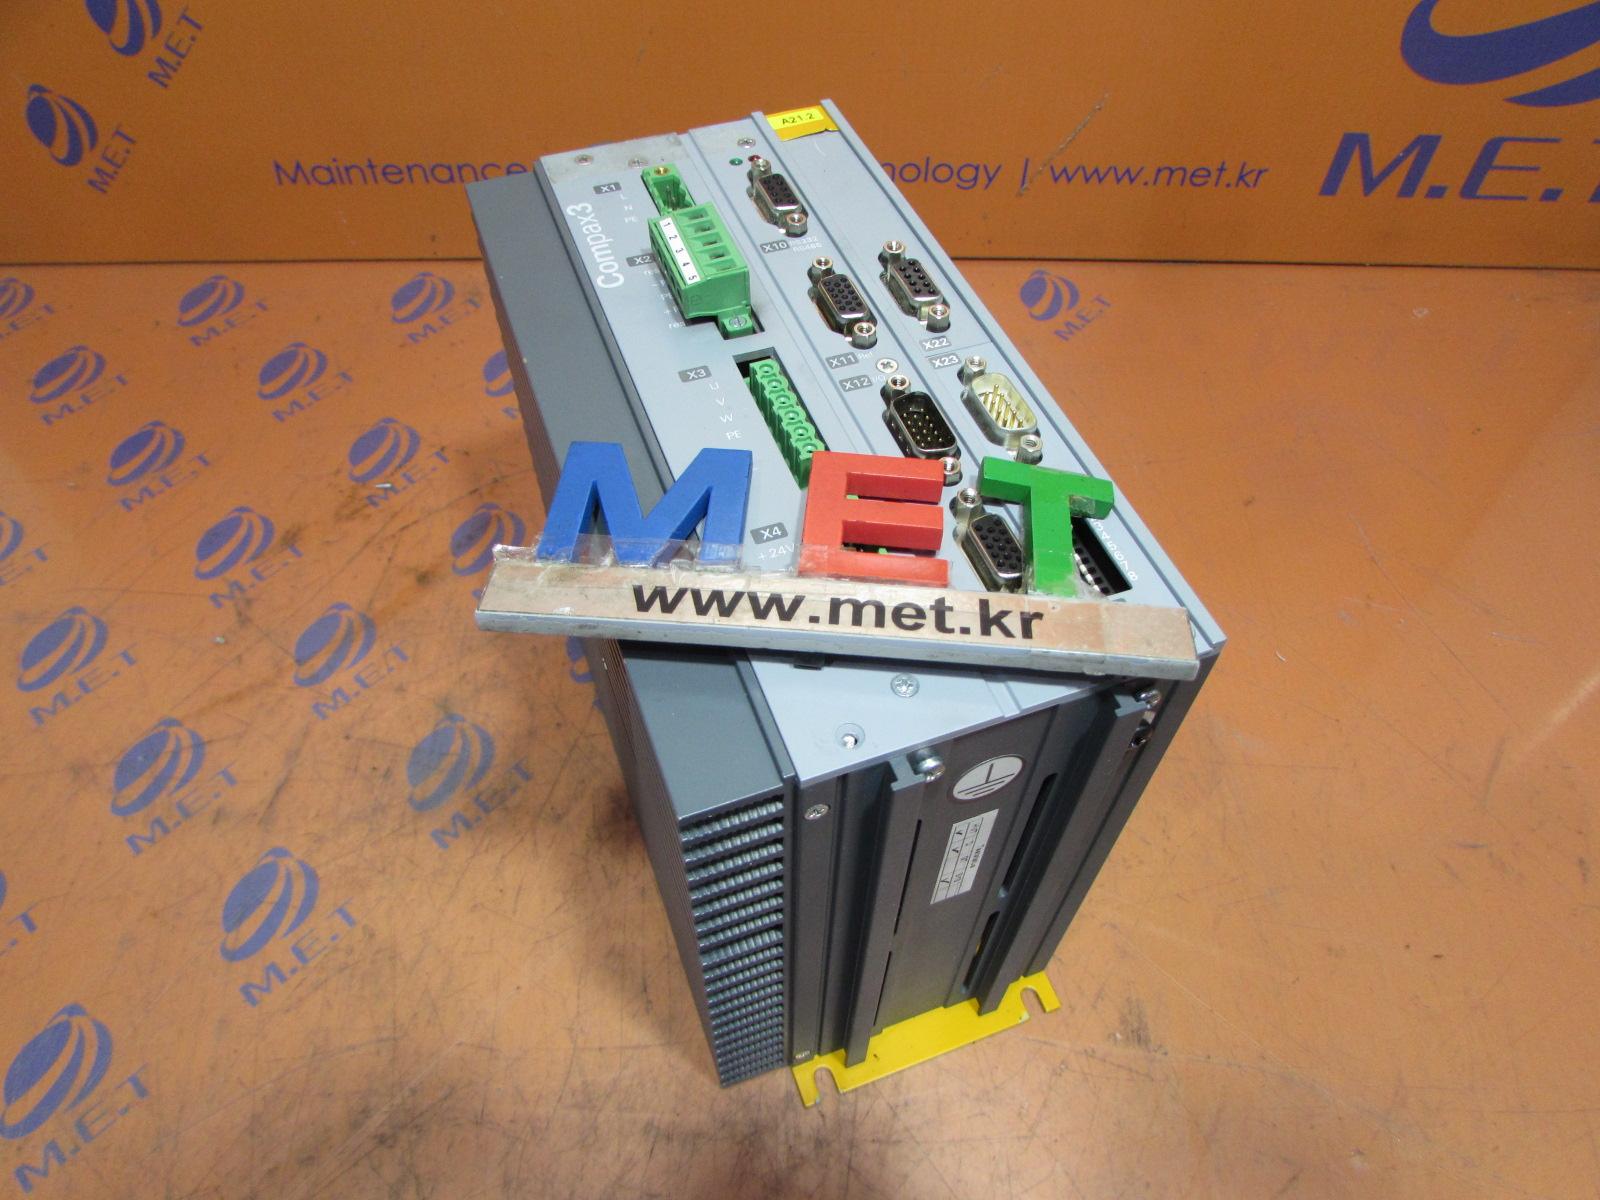 Parker C3S063V2F12 I21 T40 M00 A11 Compax3